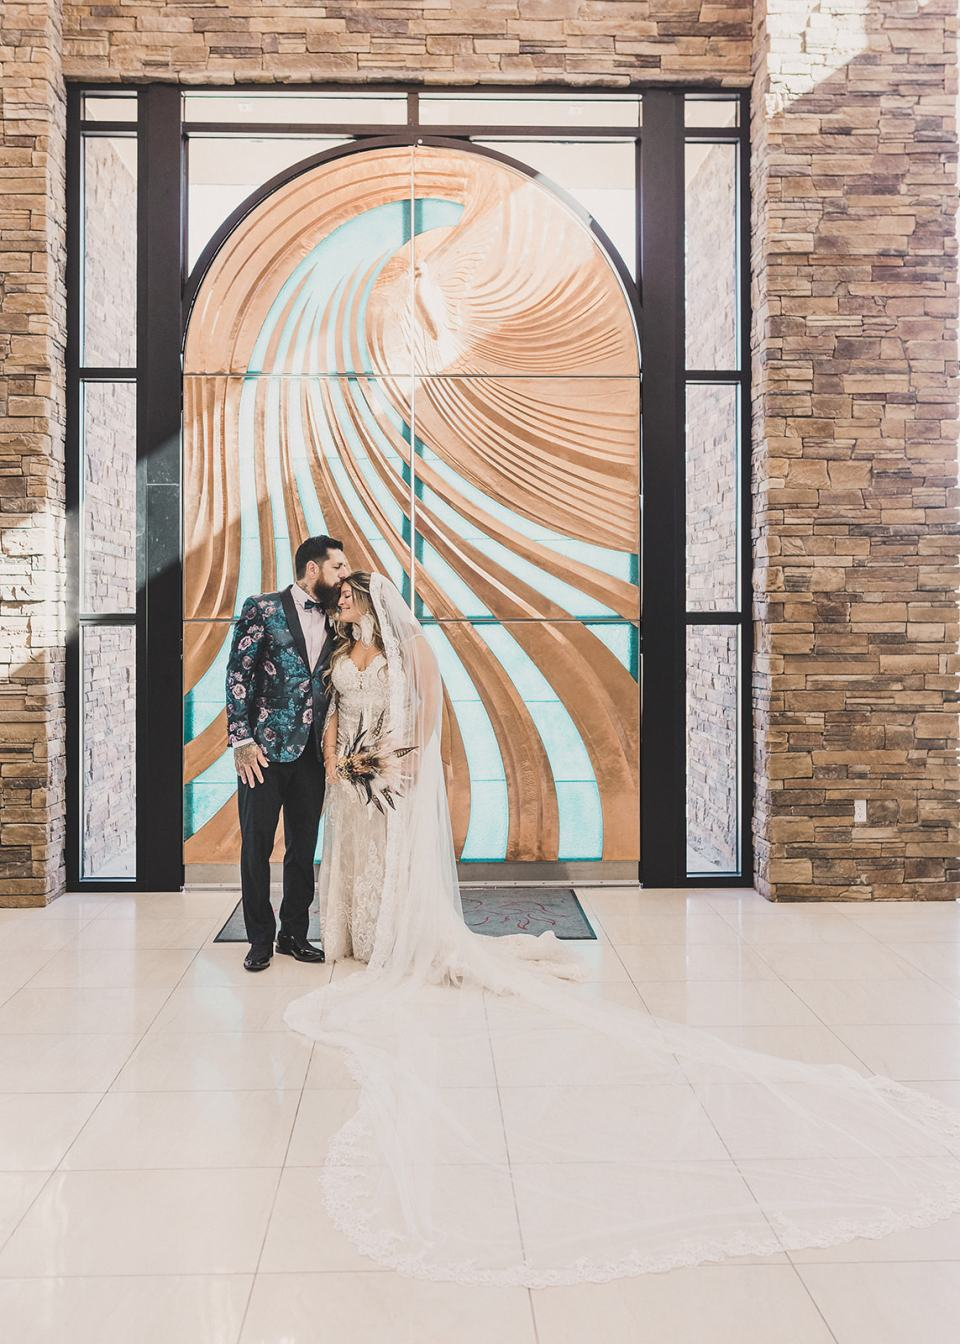 Holy Spirit Roman Catholic Church wedding portraits